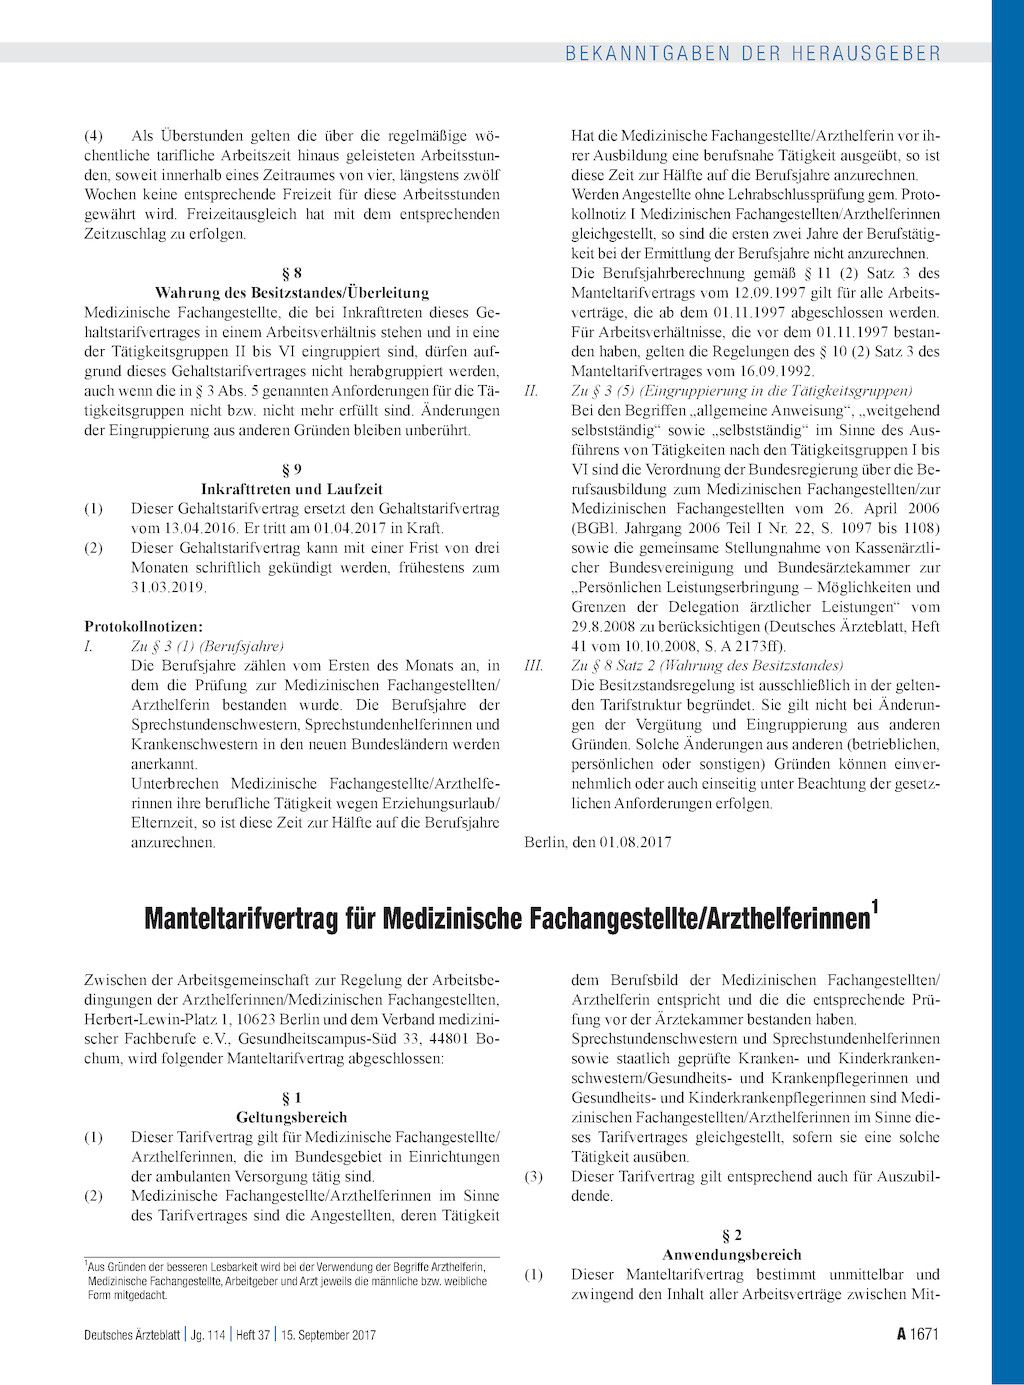 Manteltarifvertrag Fur Medizinische Fachangestellte Arzthelferinnen Medizinische Fachangestellte Angestellte Medizin